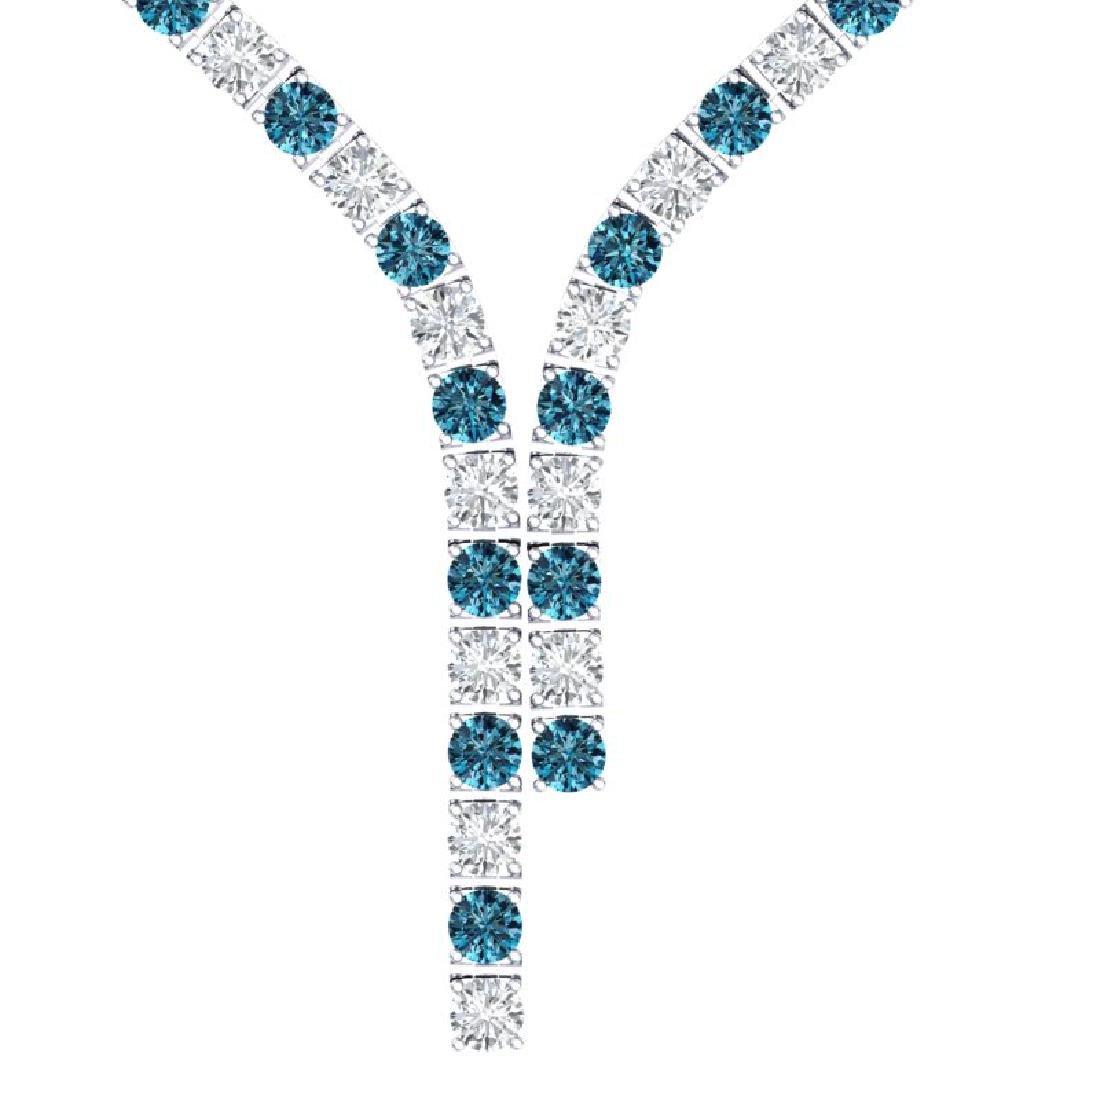 40 CTW SI/I Intense Blue & White Diamond Necklace 18K